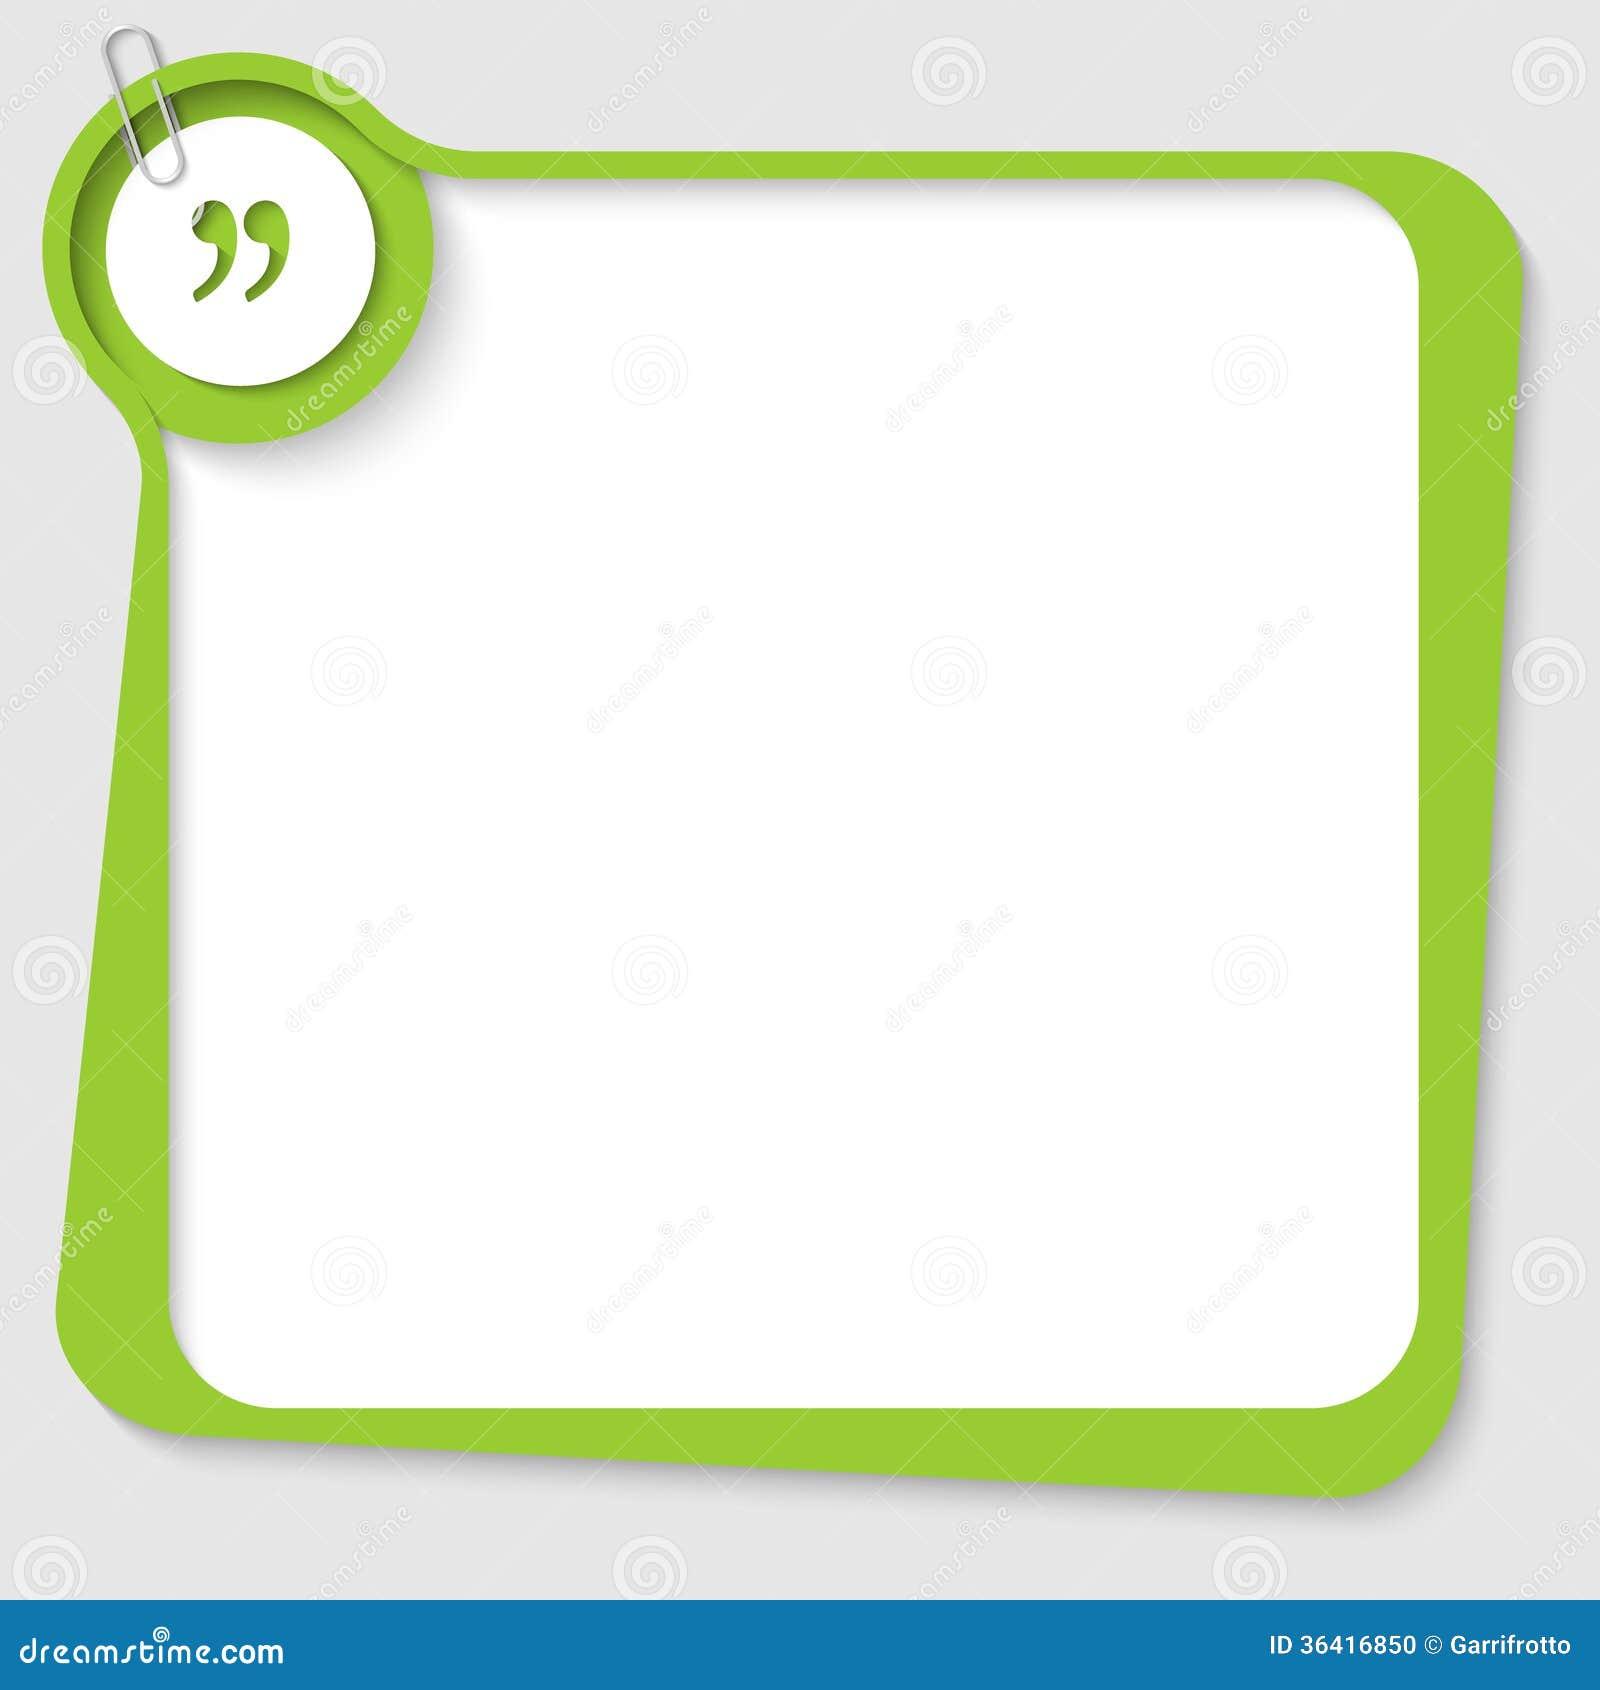 Green blank text box